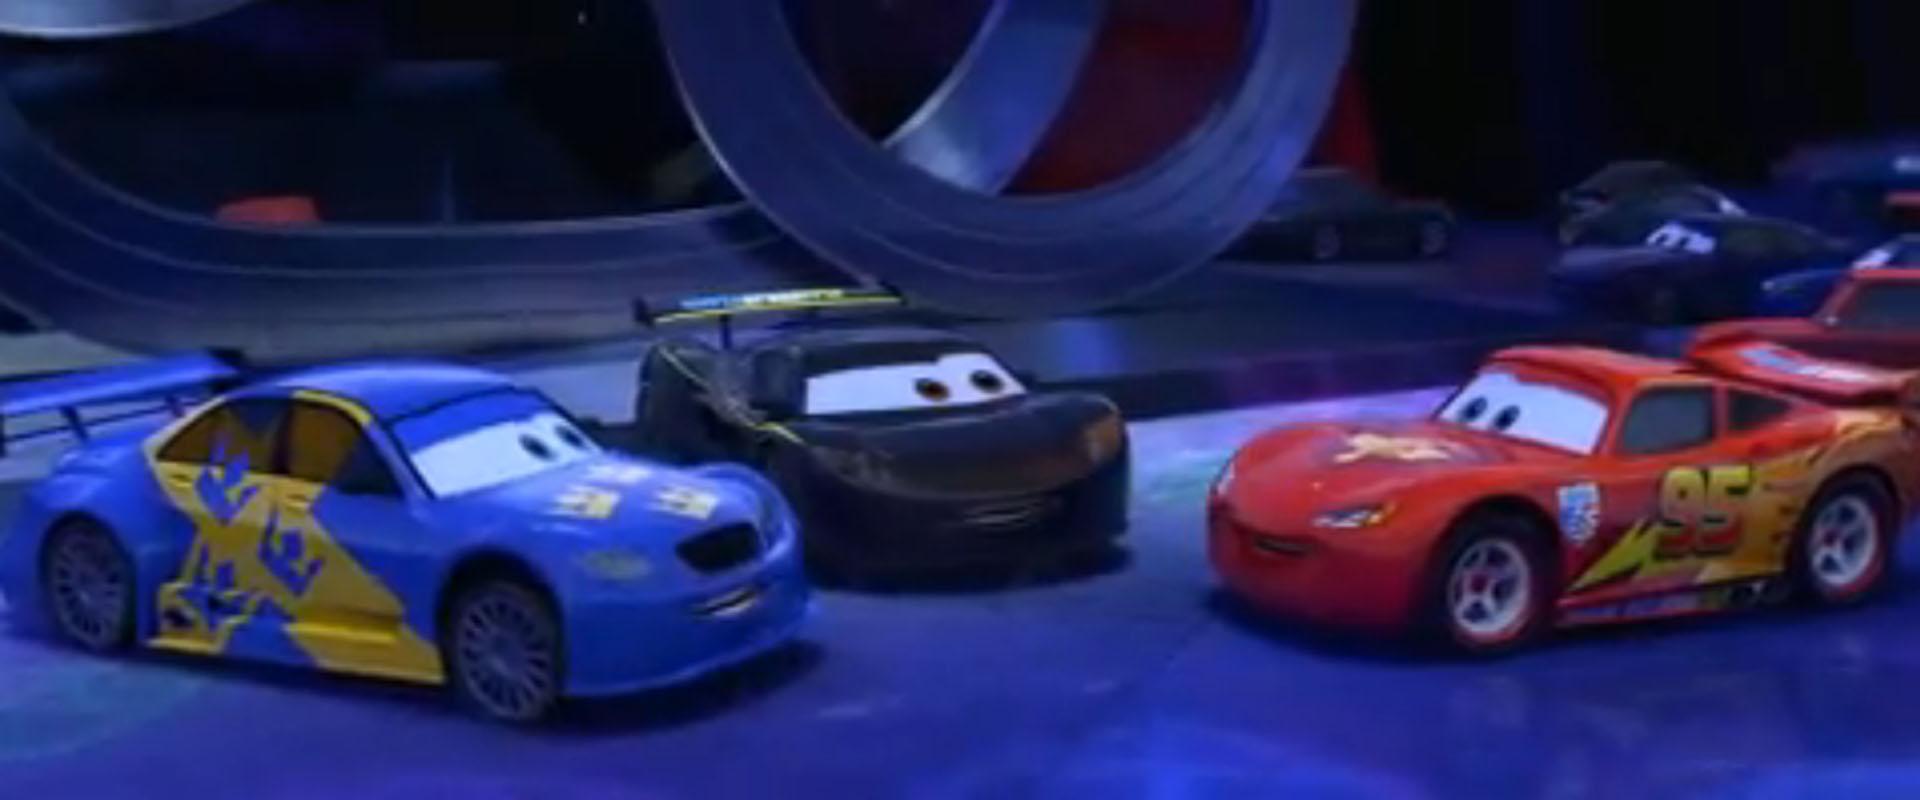 jan-flash-nilsson-personnage-cars-2-01